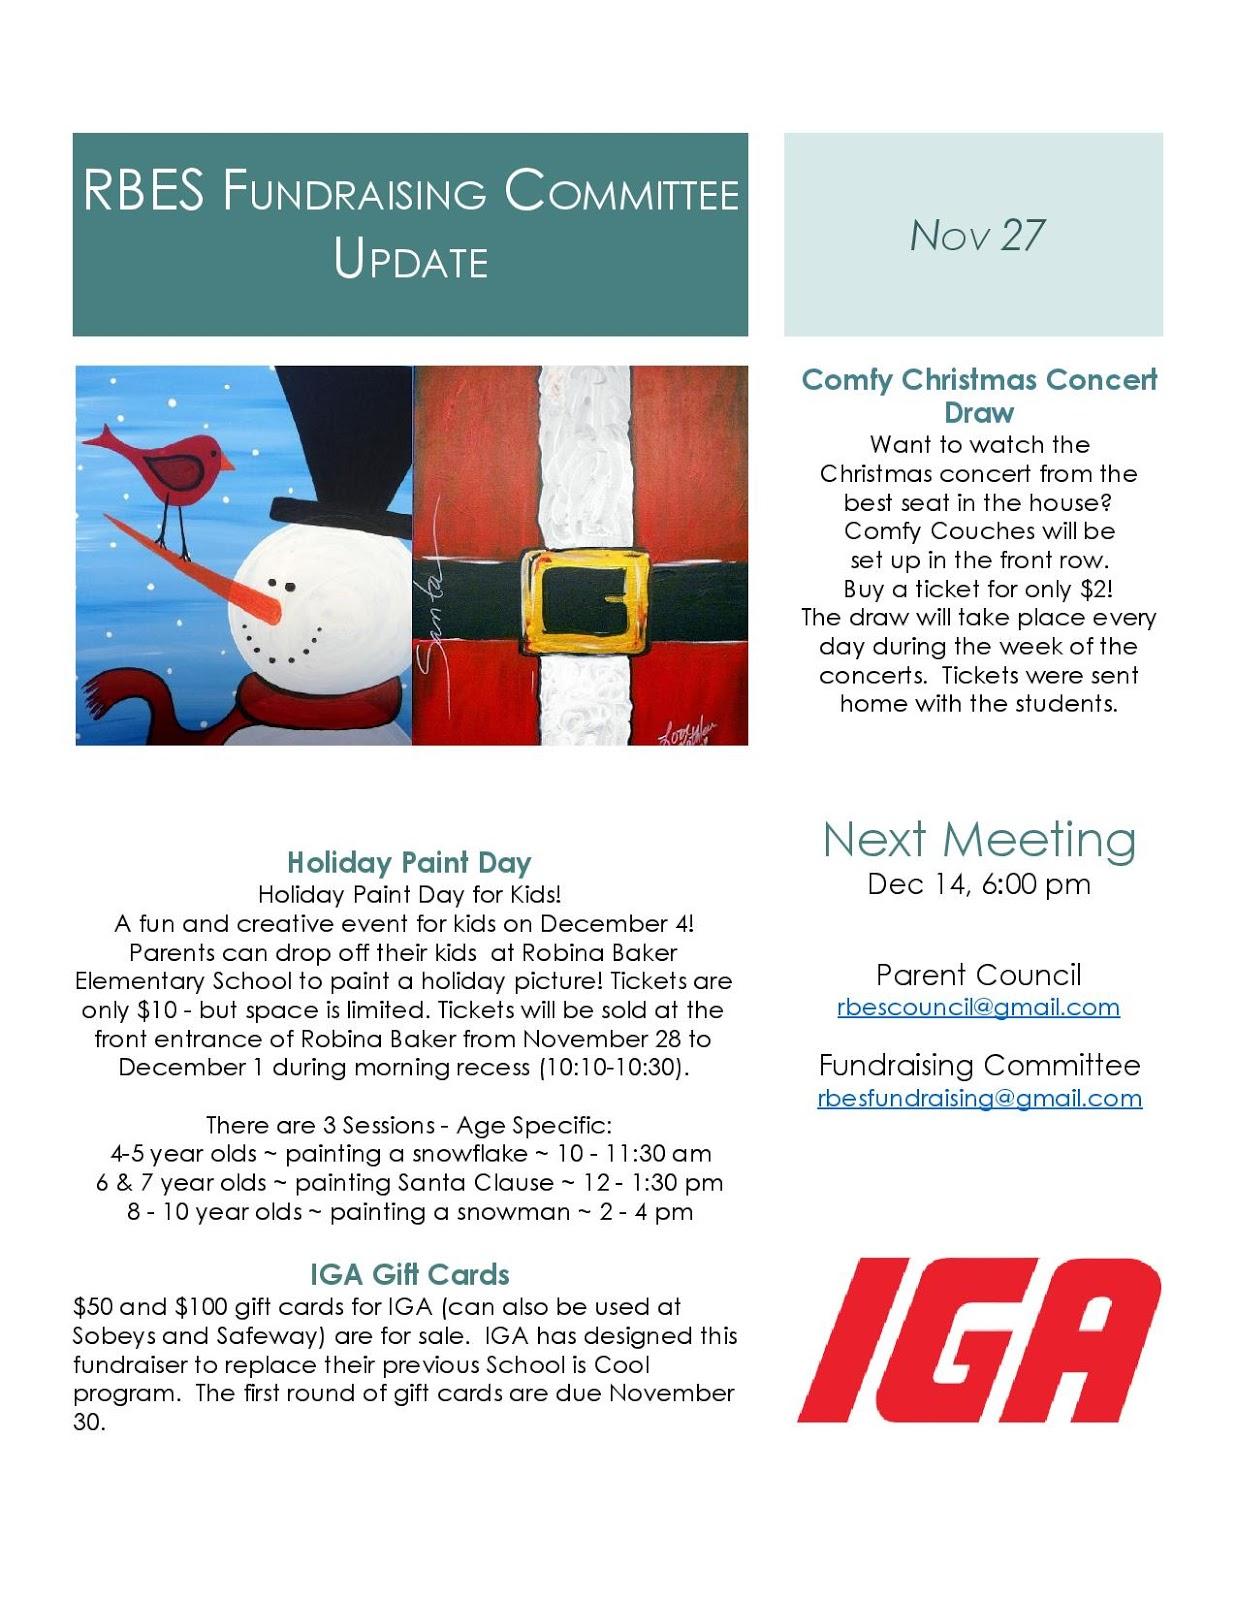 RBES News: November 2016